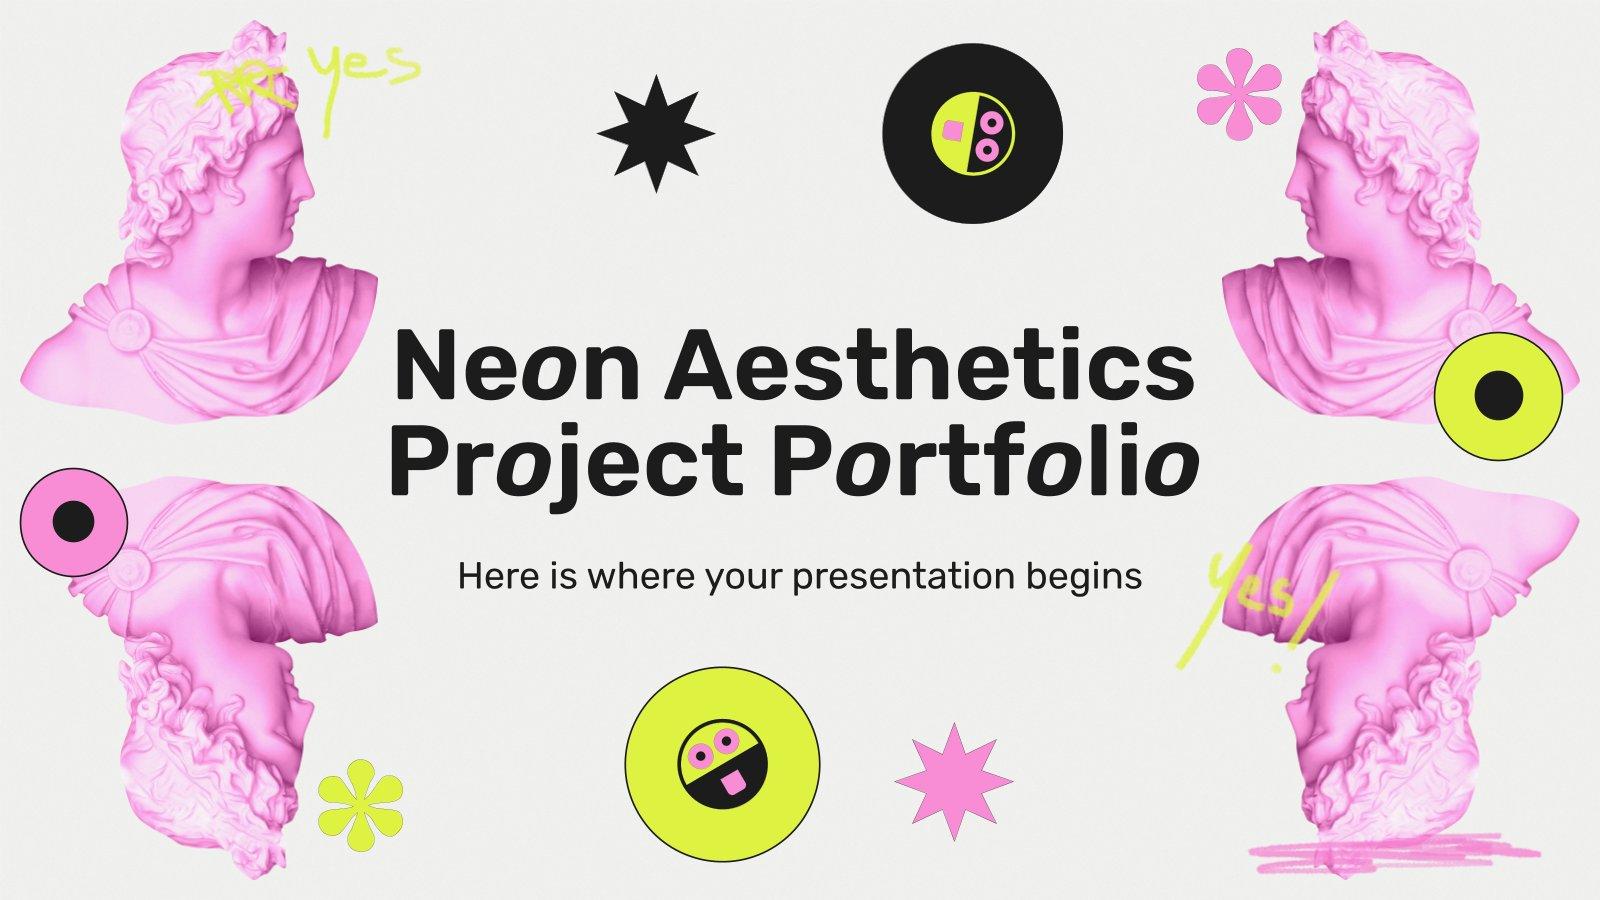 Neon Aesthetics Projekt Portfolio Präsentationsvorlage